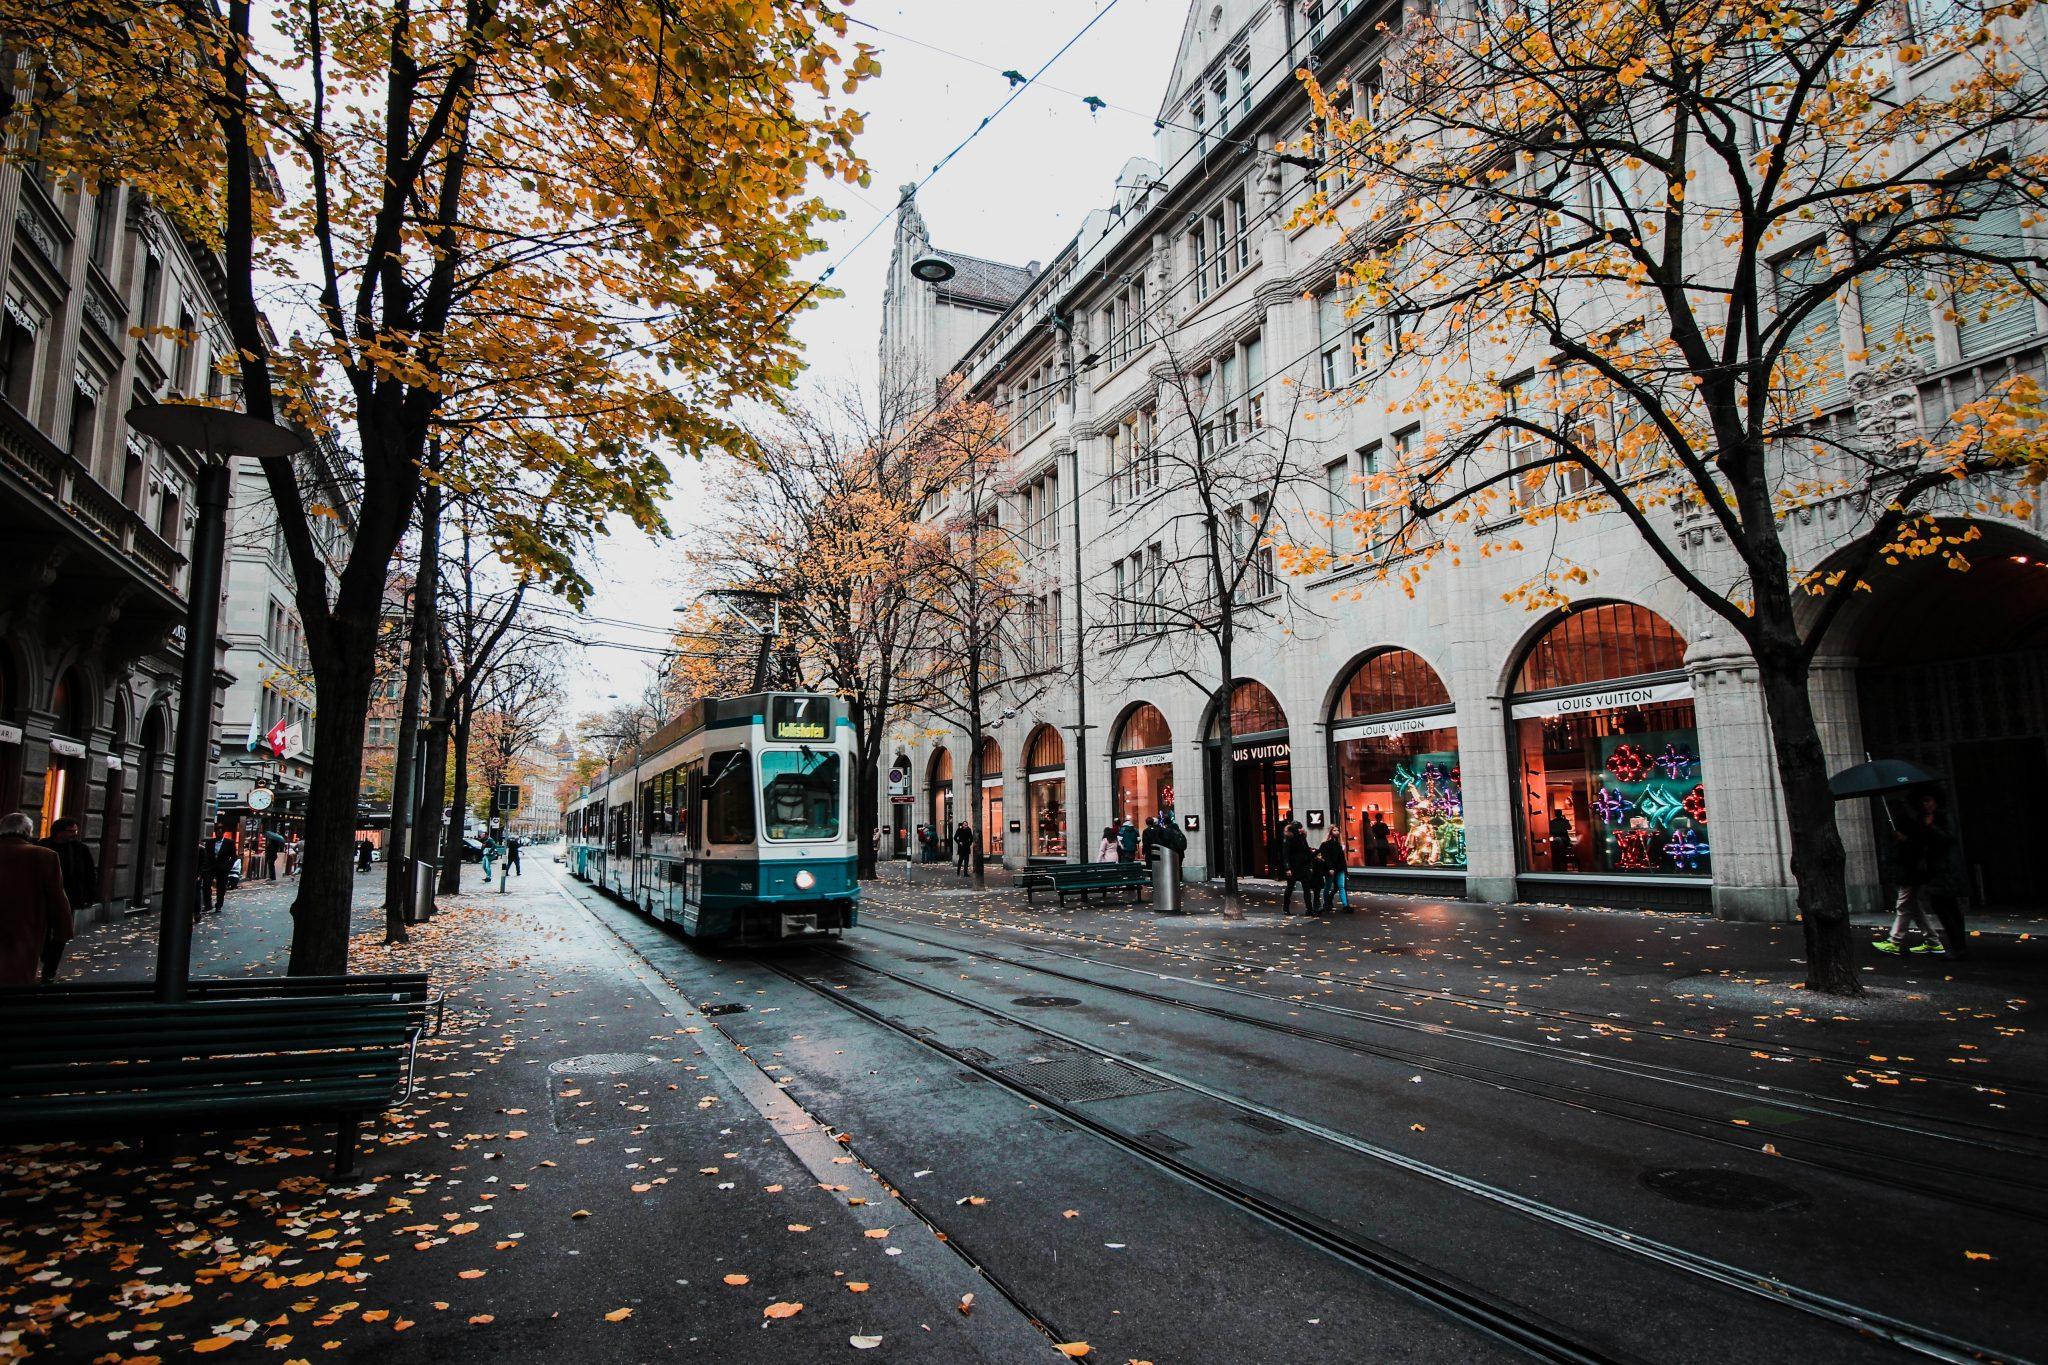 architecture-autumn-avenue-773471